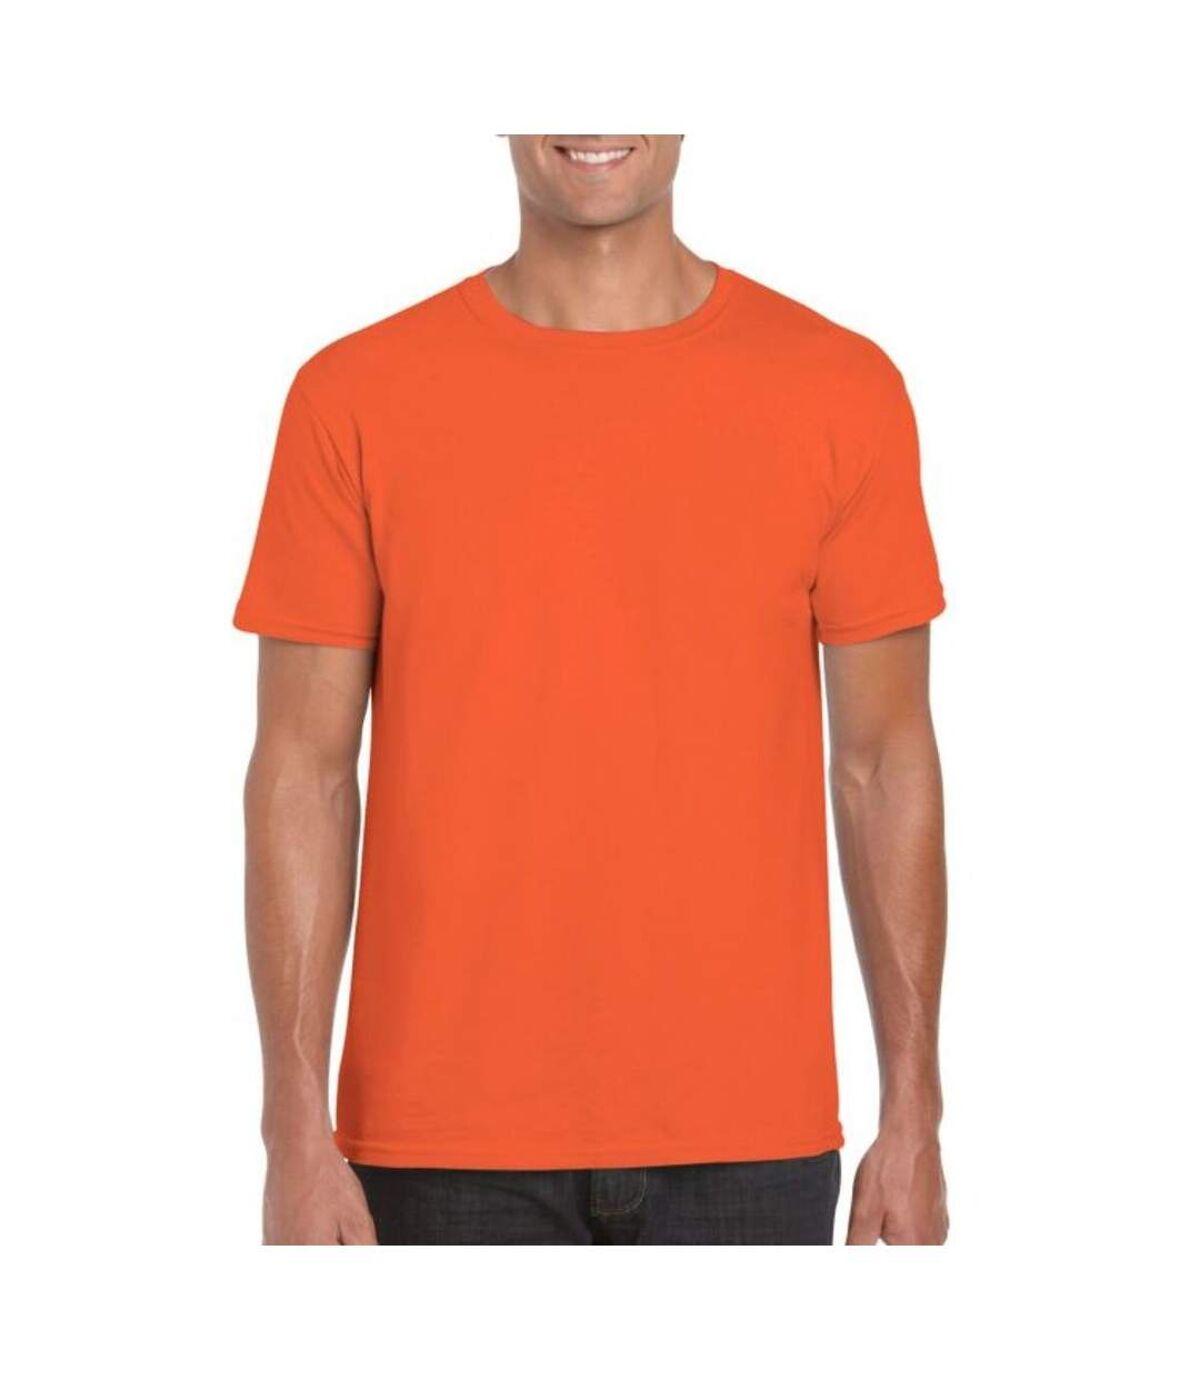 Gildan Mens Soft Style Ringspun T Shirt (Orange) - UTPC2882